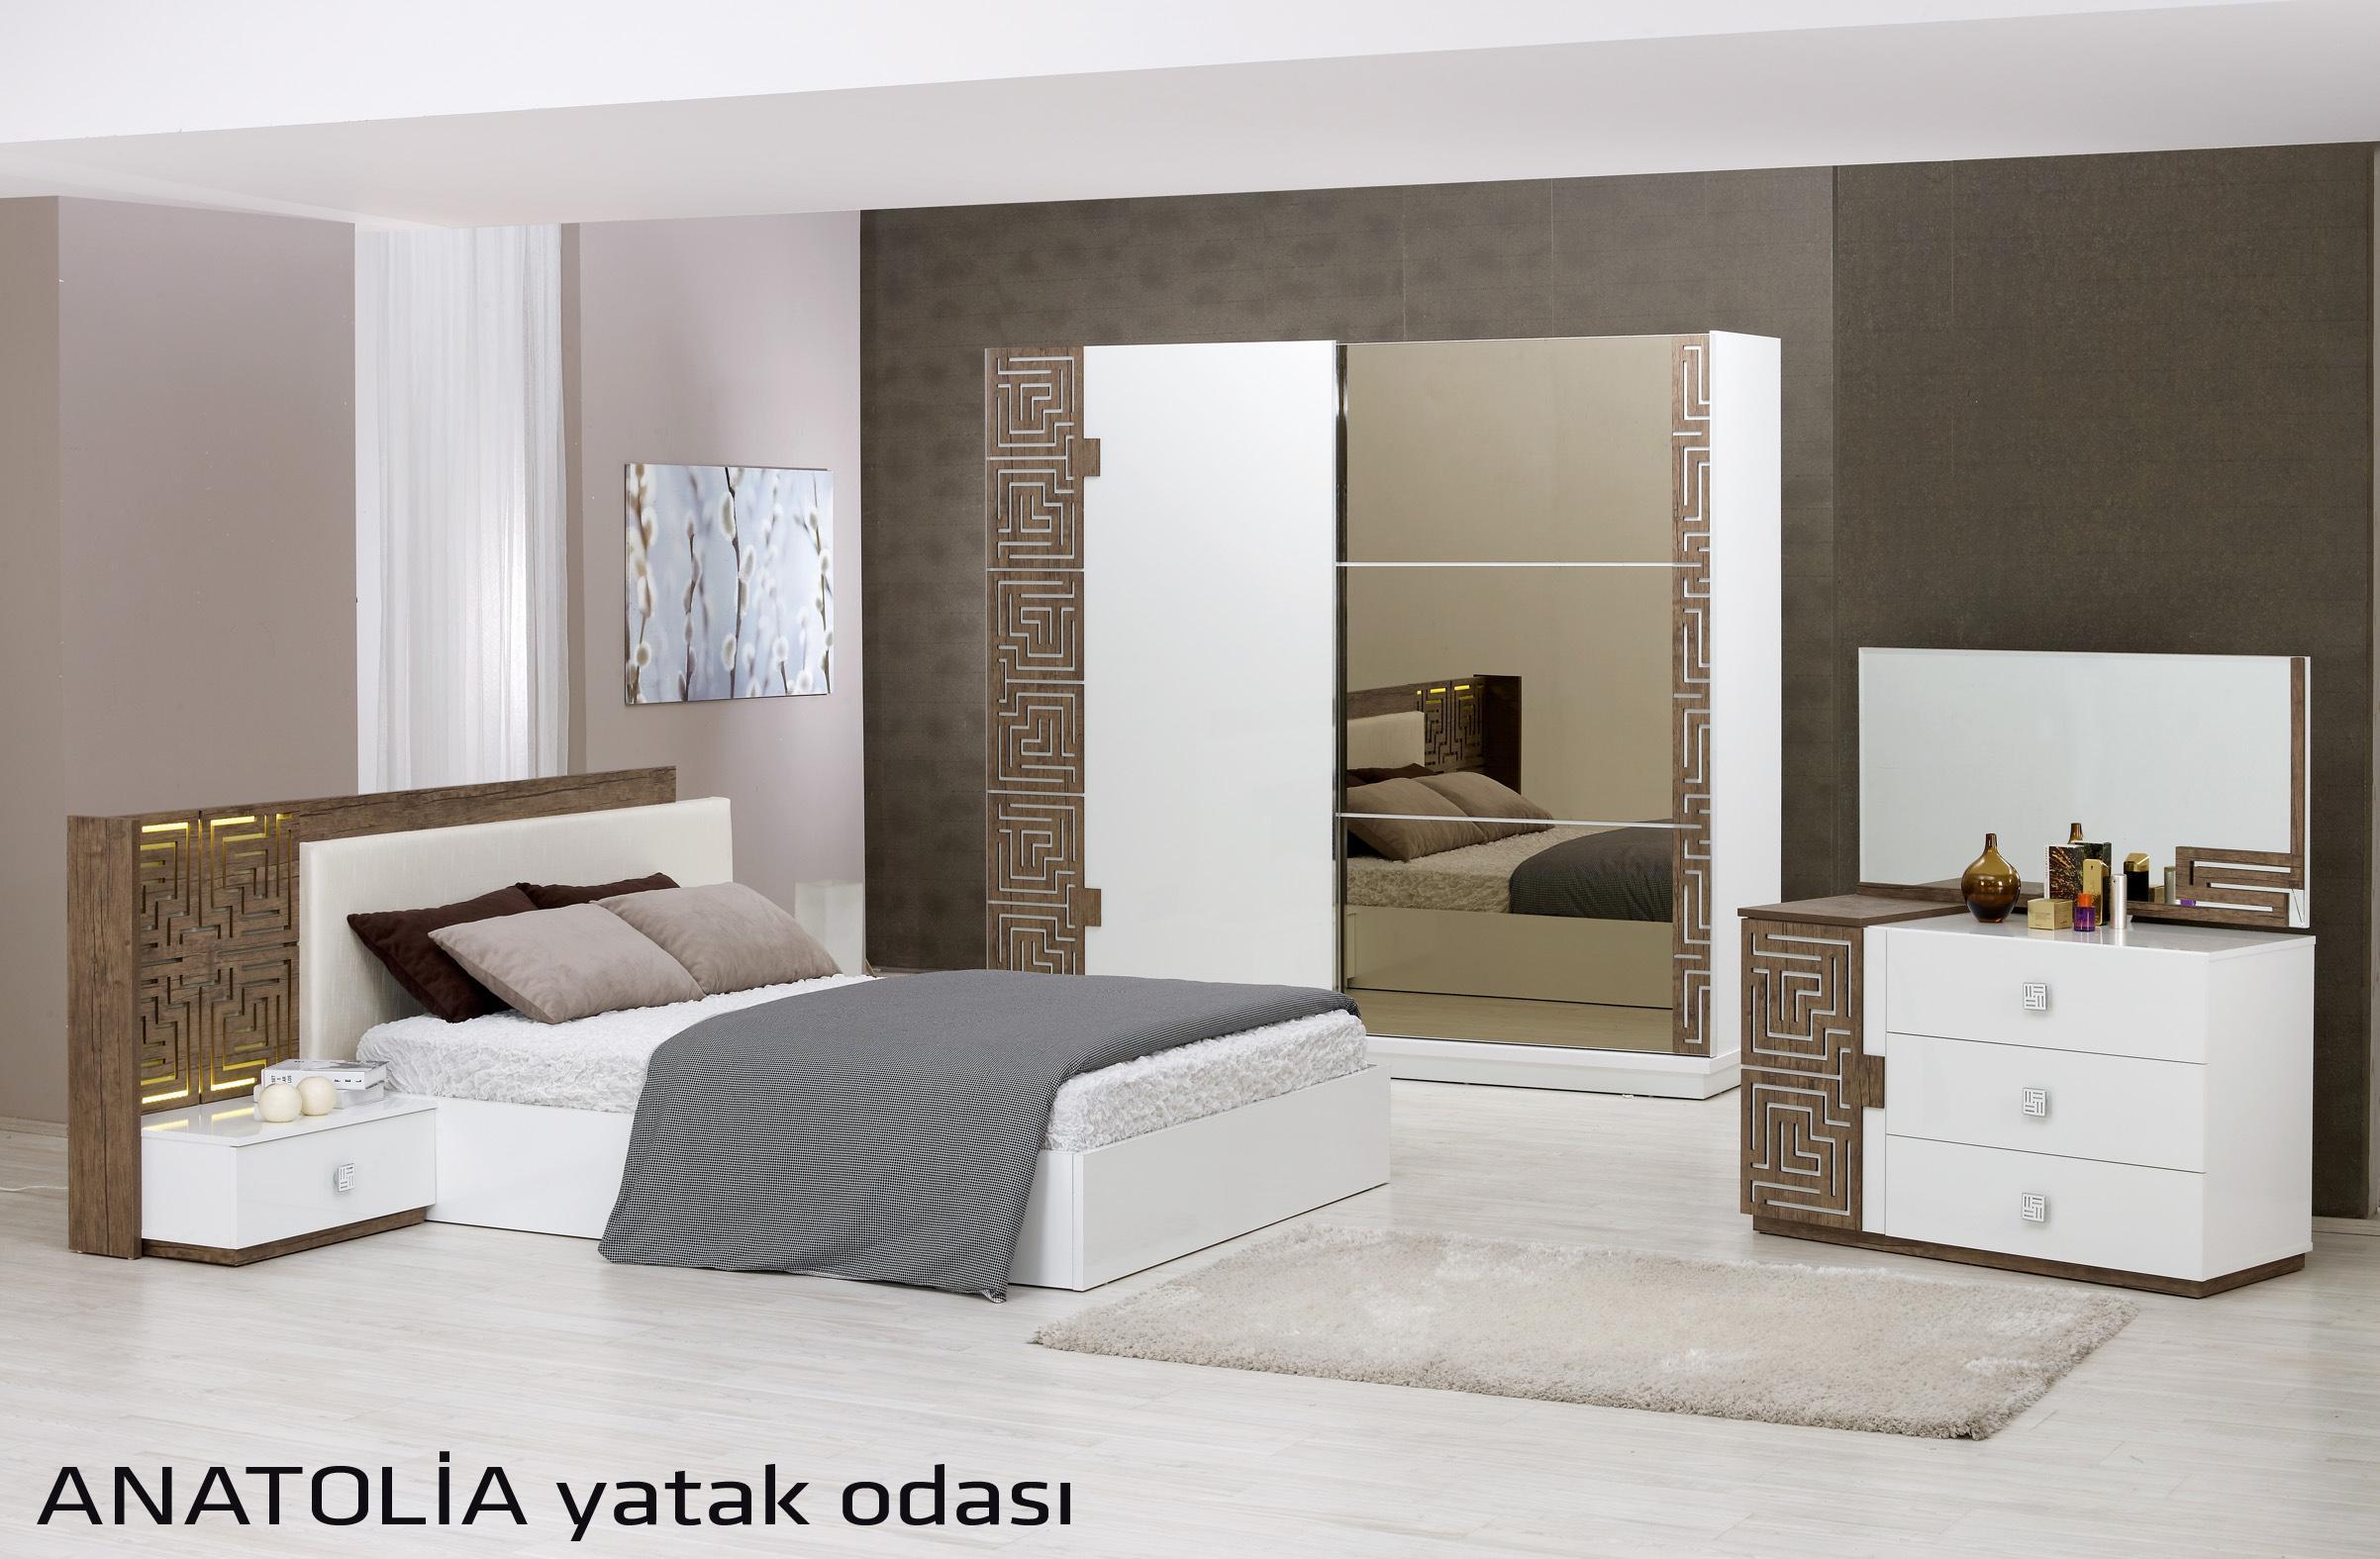 Camera da letto matrimoniale usate roma ~ avienix.com for .